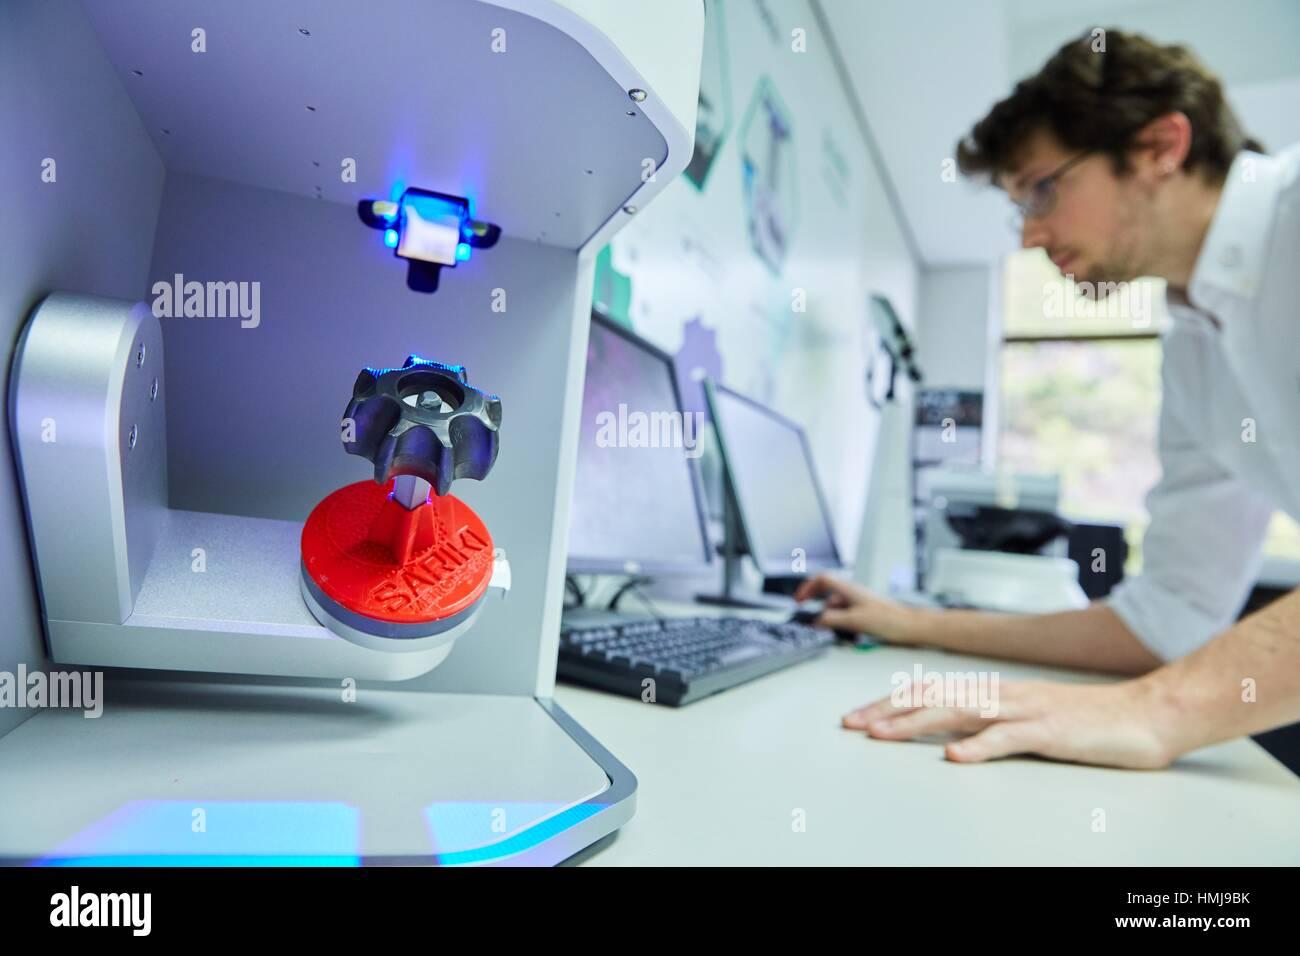 Scanner 3D. Metrologia innovativa applicata. Metrologia Sariki. Elgoibar. Gipuzkoa. Paese basco. Spagna. Immagini Stock